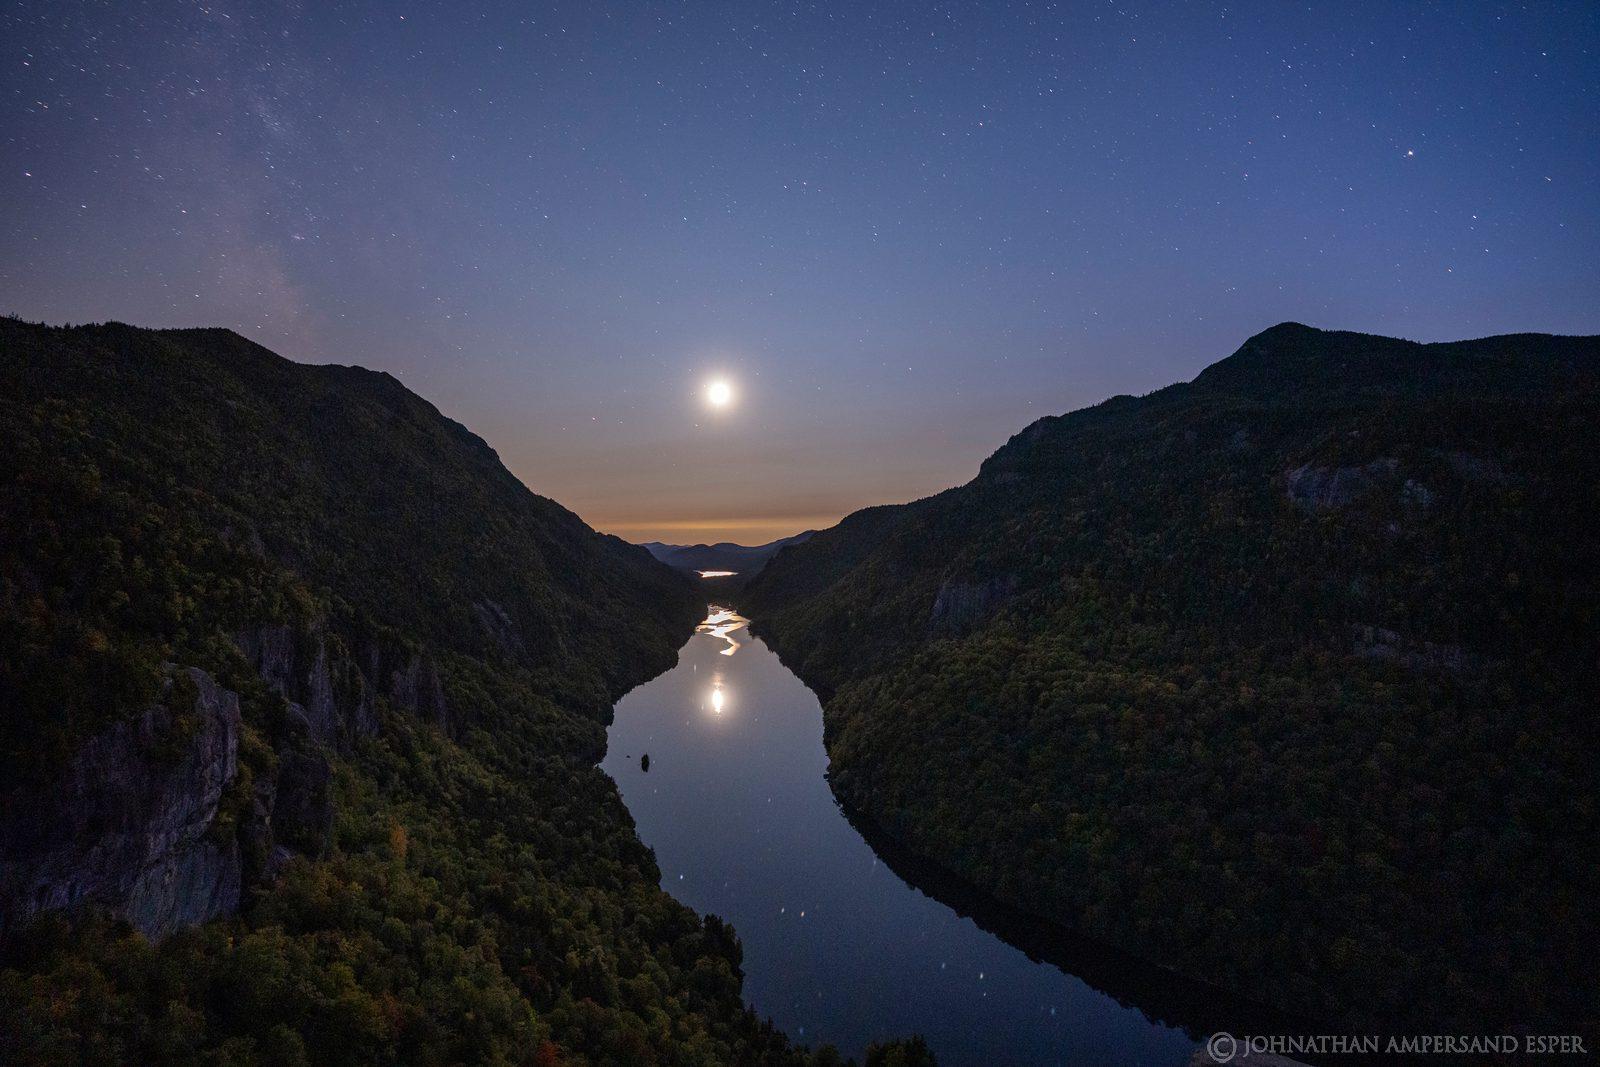 Ausable Lake,Lower Ausable Lake,Indian Head,full moon,moon,moonlight,night,2020,